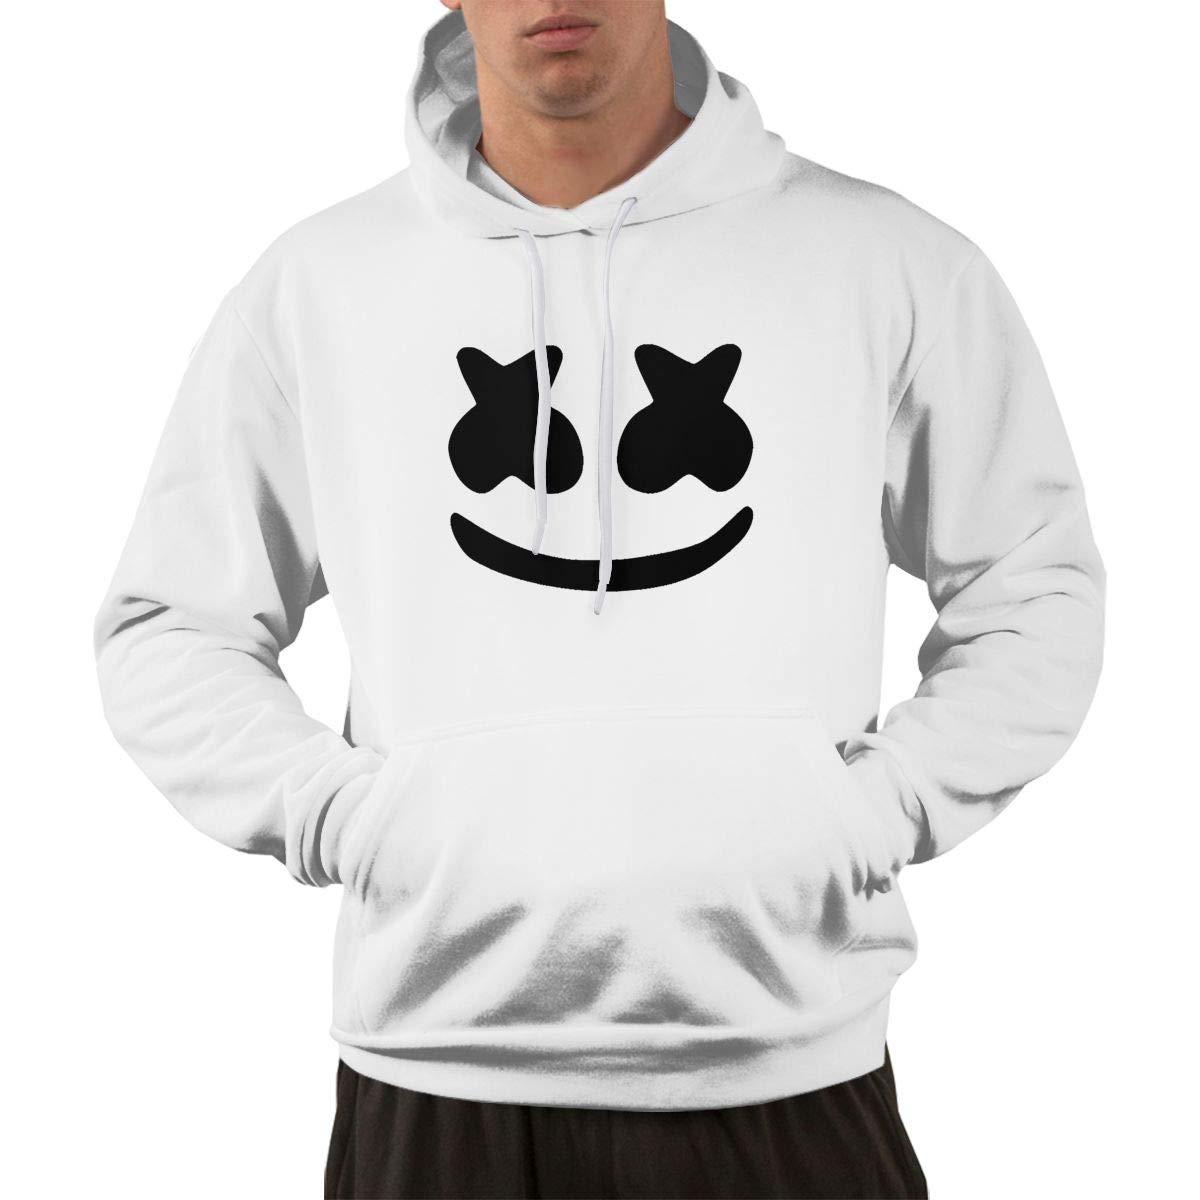 dae4c3ed7bc7 Amazon.com  Kings Are Born Cool Marshmello Face Men s Women s Hoodies  Sweatshirts White Unisex XXXL  Clothing